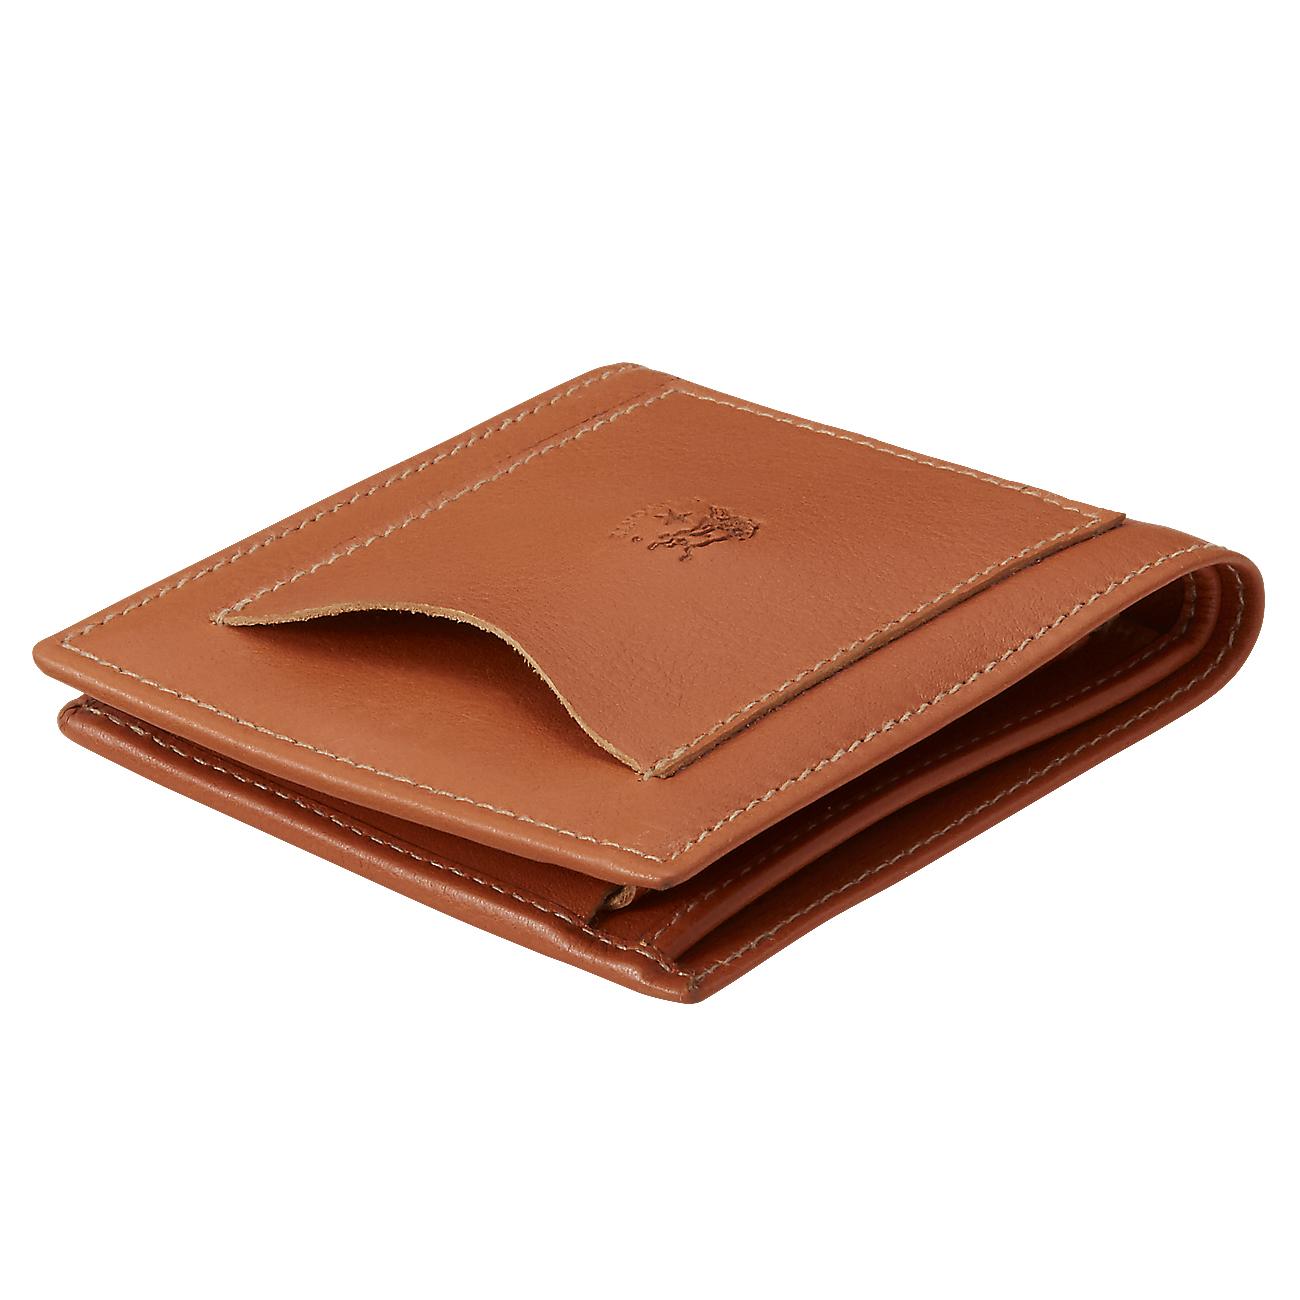 IL BISONTE (イル ビゾンテ) 日本公式オンラインストア 2つ折財布 54192304540